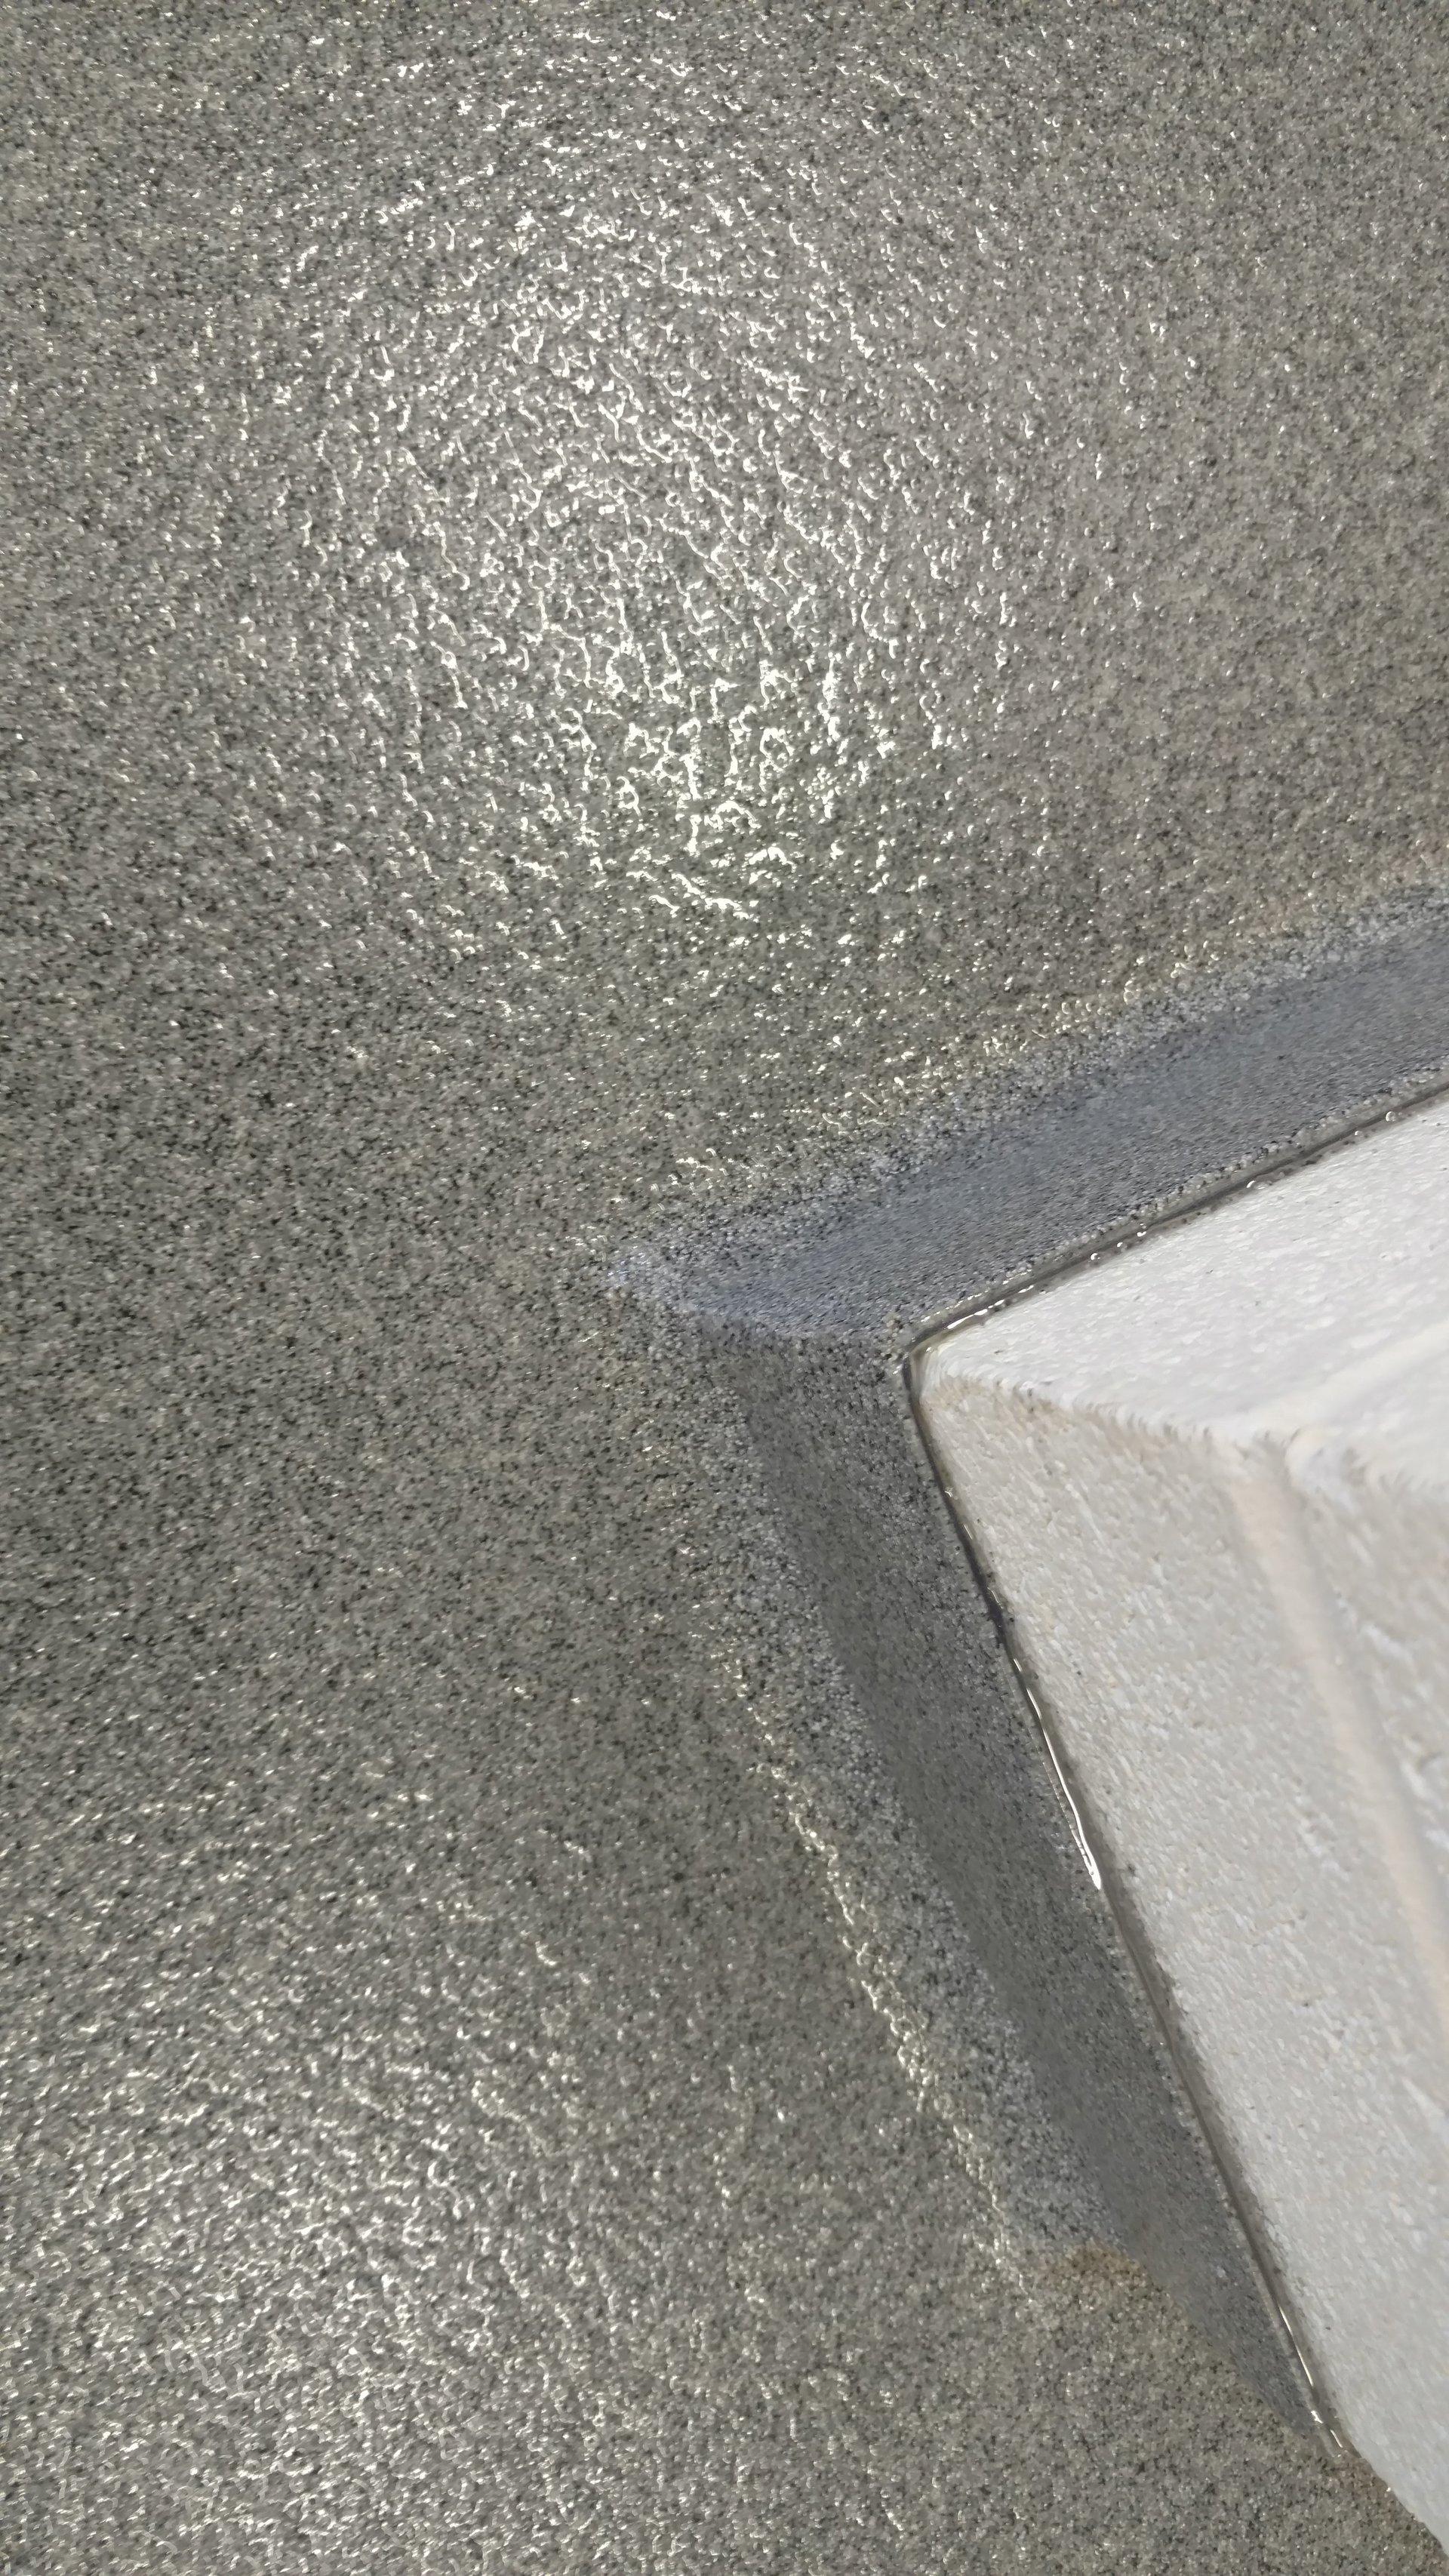 Cementitious Urethane Flooring